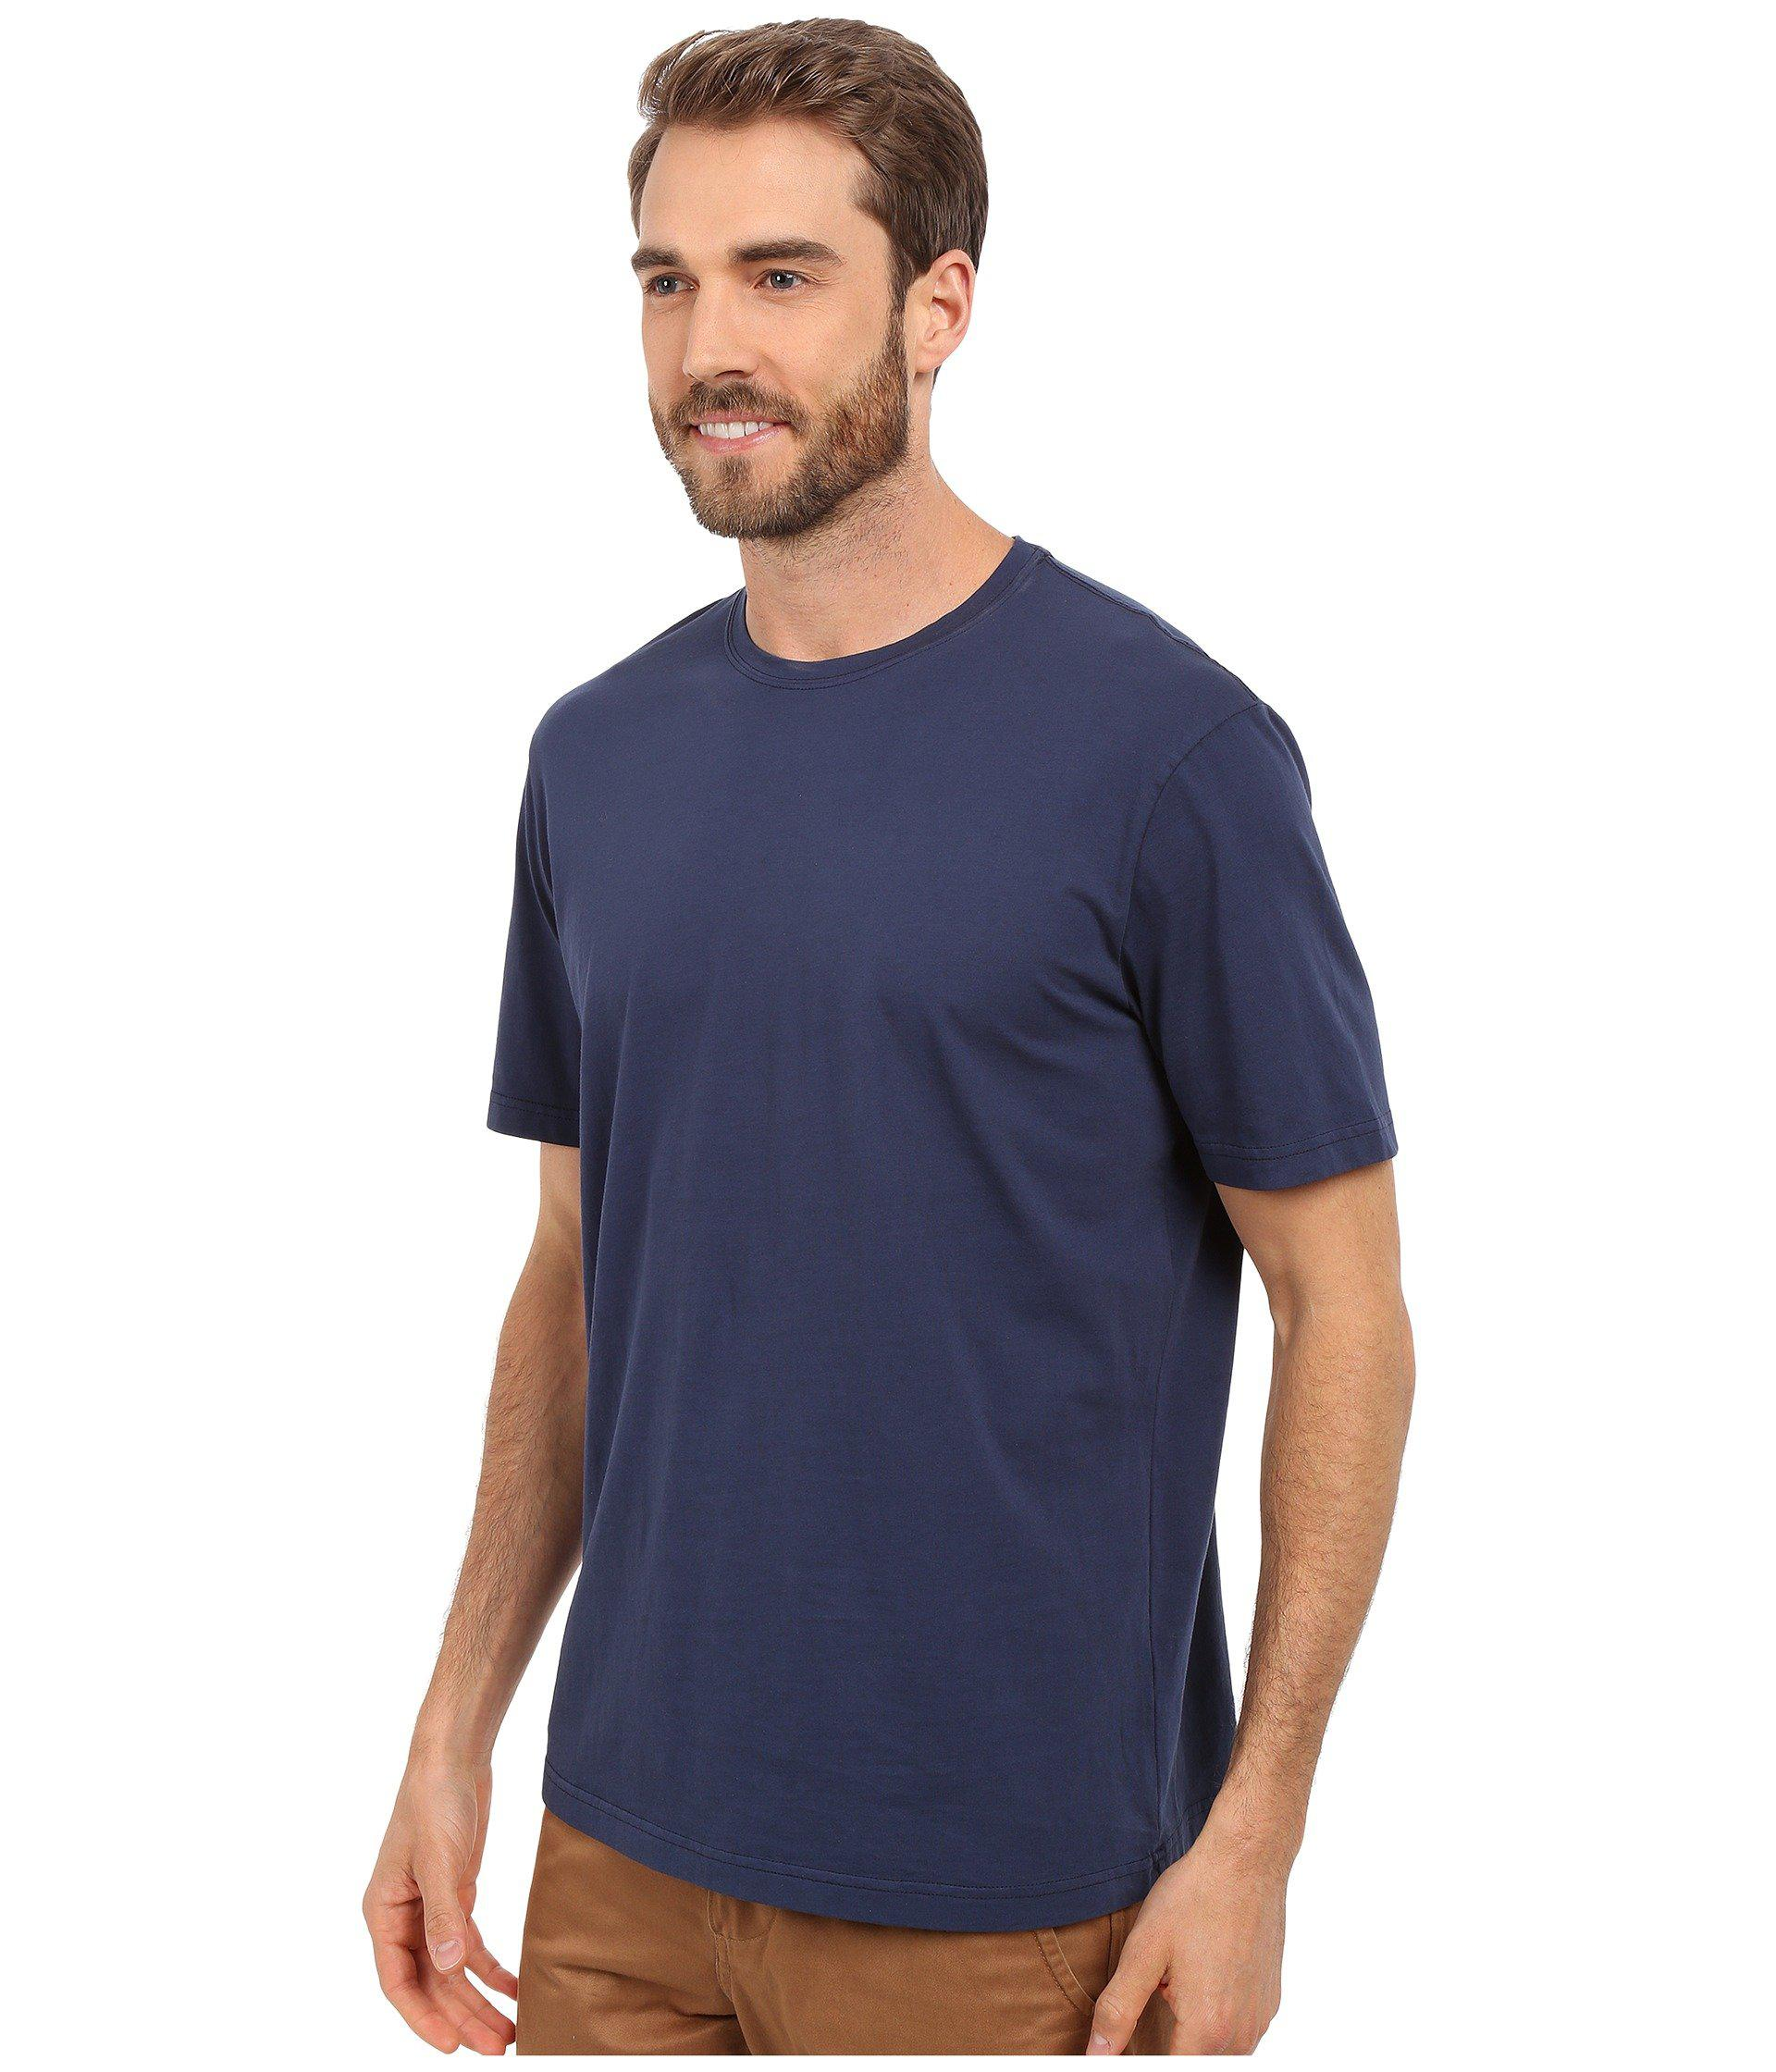 ed4627cad Lyst - Mod-o-doc Sunset Short Sleeve Crew (new Navy) Men's Short Sleeve  Pullover in Blue for Men